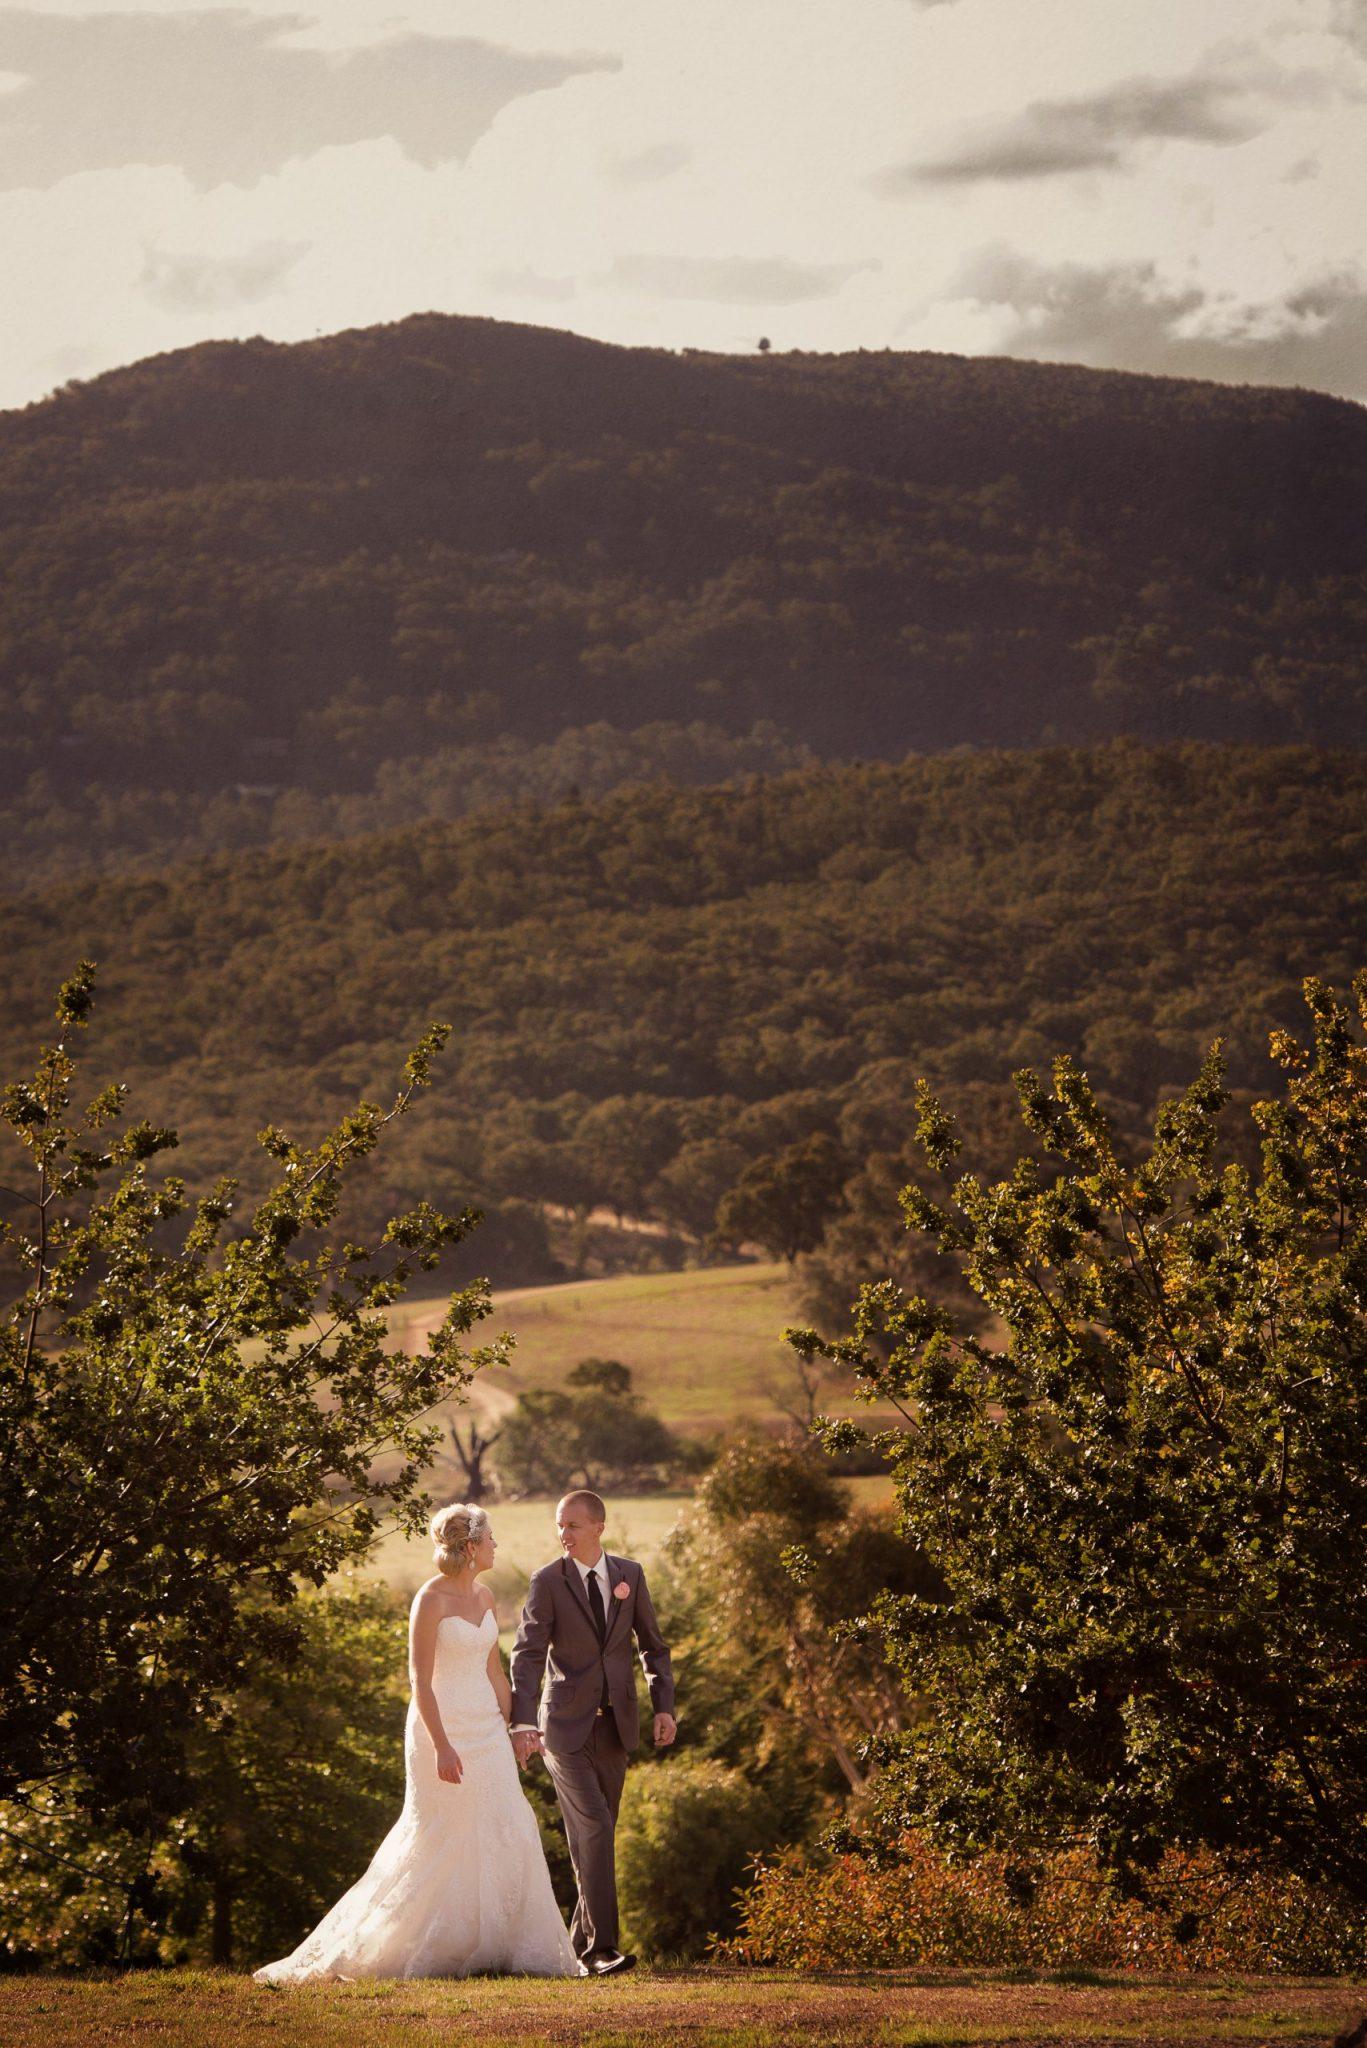 Wedding in the Macedon ranges